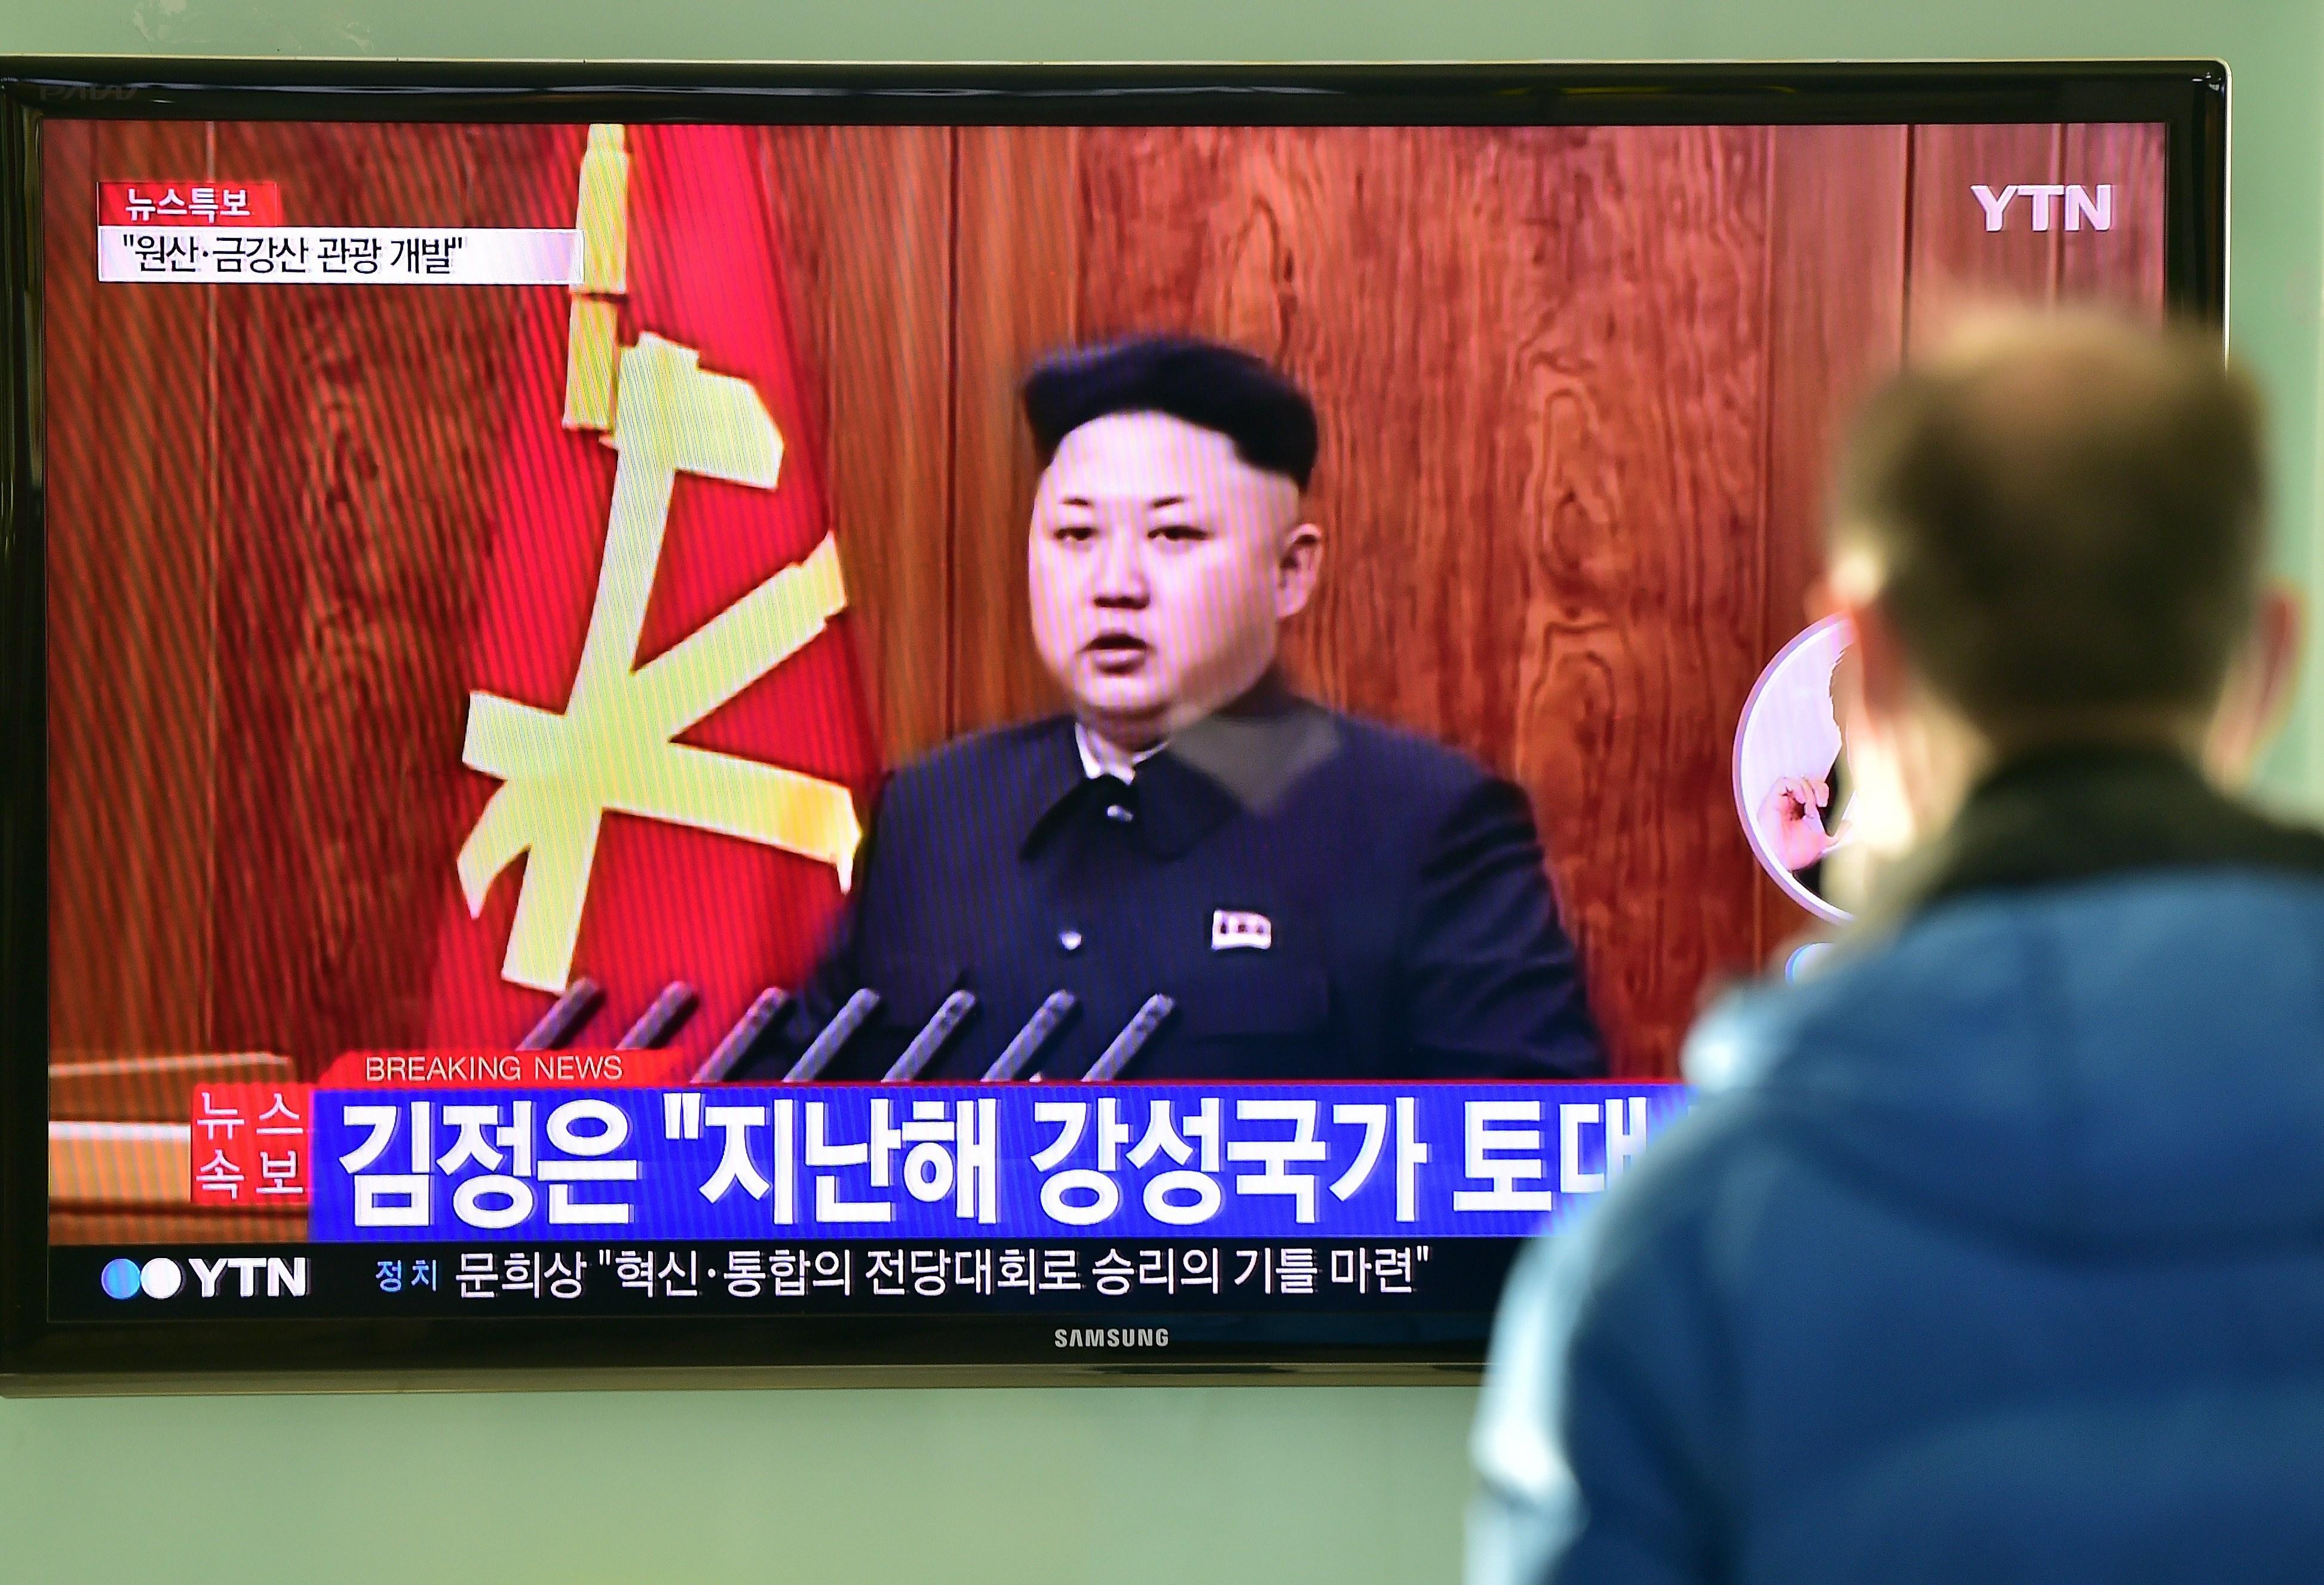 'The Interview': North Korea Responds to U.S. Sanctions